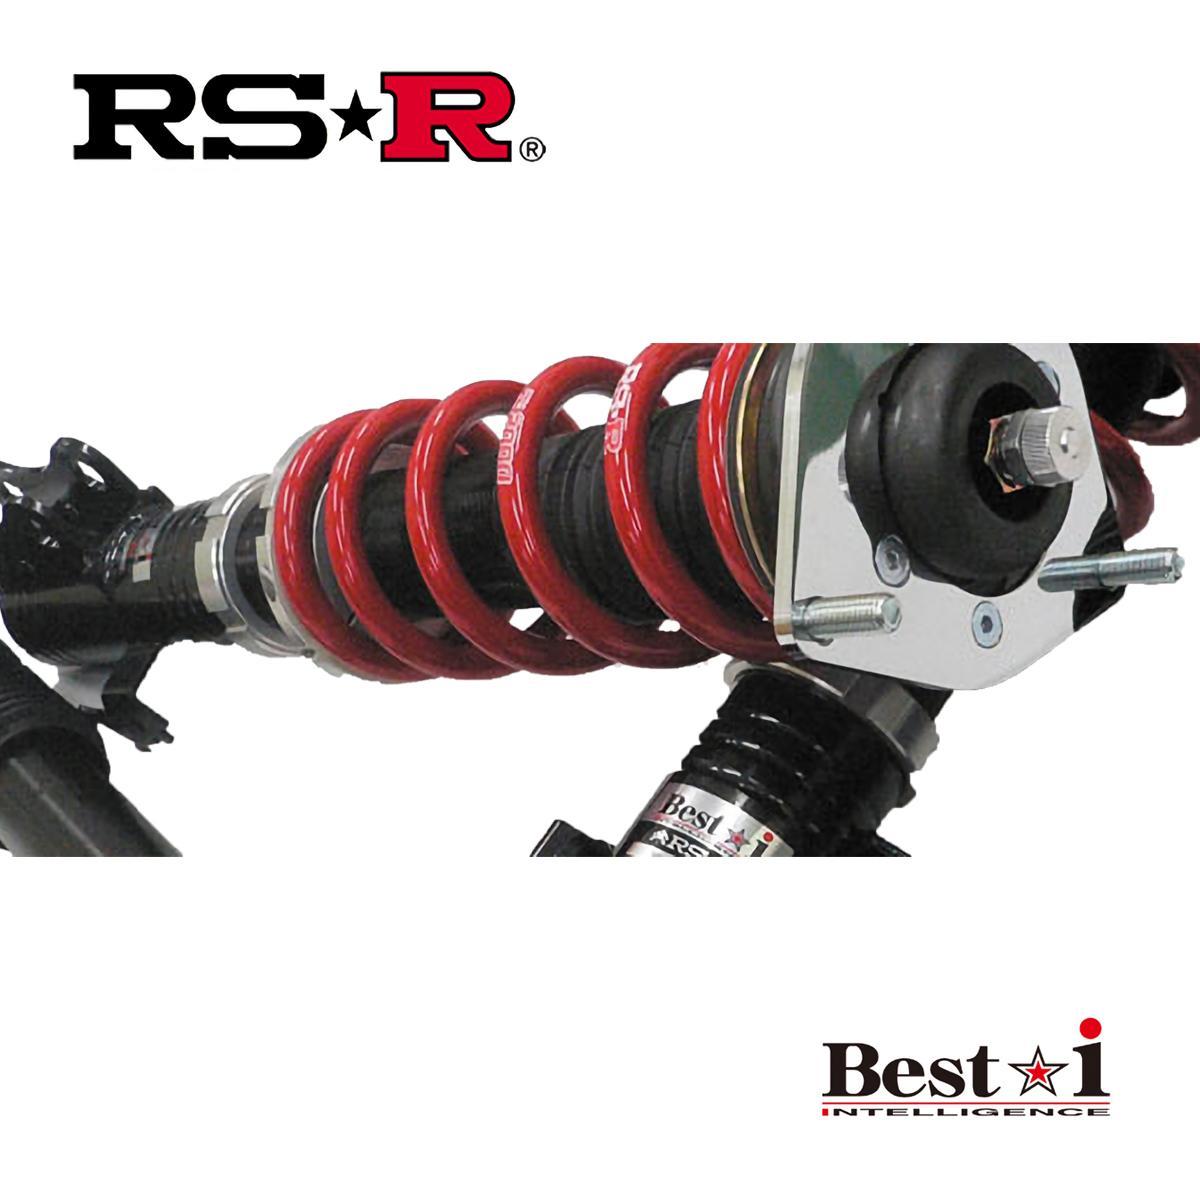 RS-R プリウス Sナビパッケージ ZVW52 車高調 リア車高調整:ネジ式/ハードバネレート仕様 BIT583H ベストi RSR 個人宅発送追金有